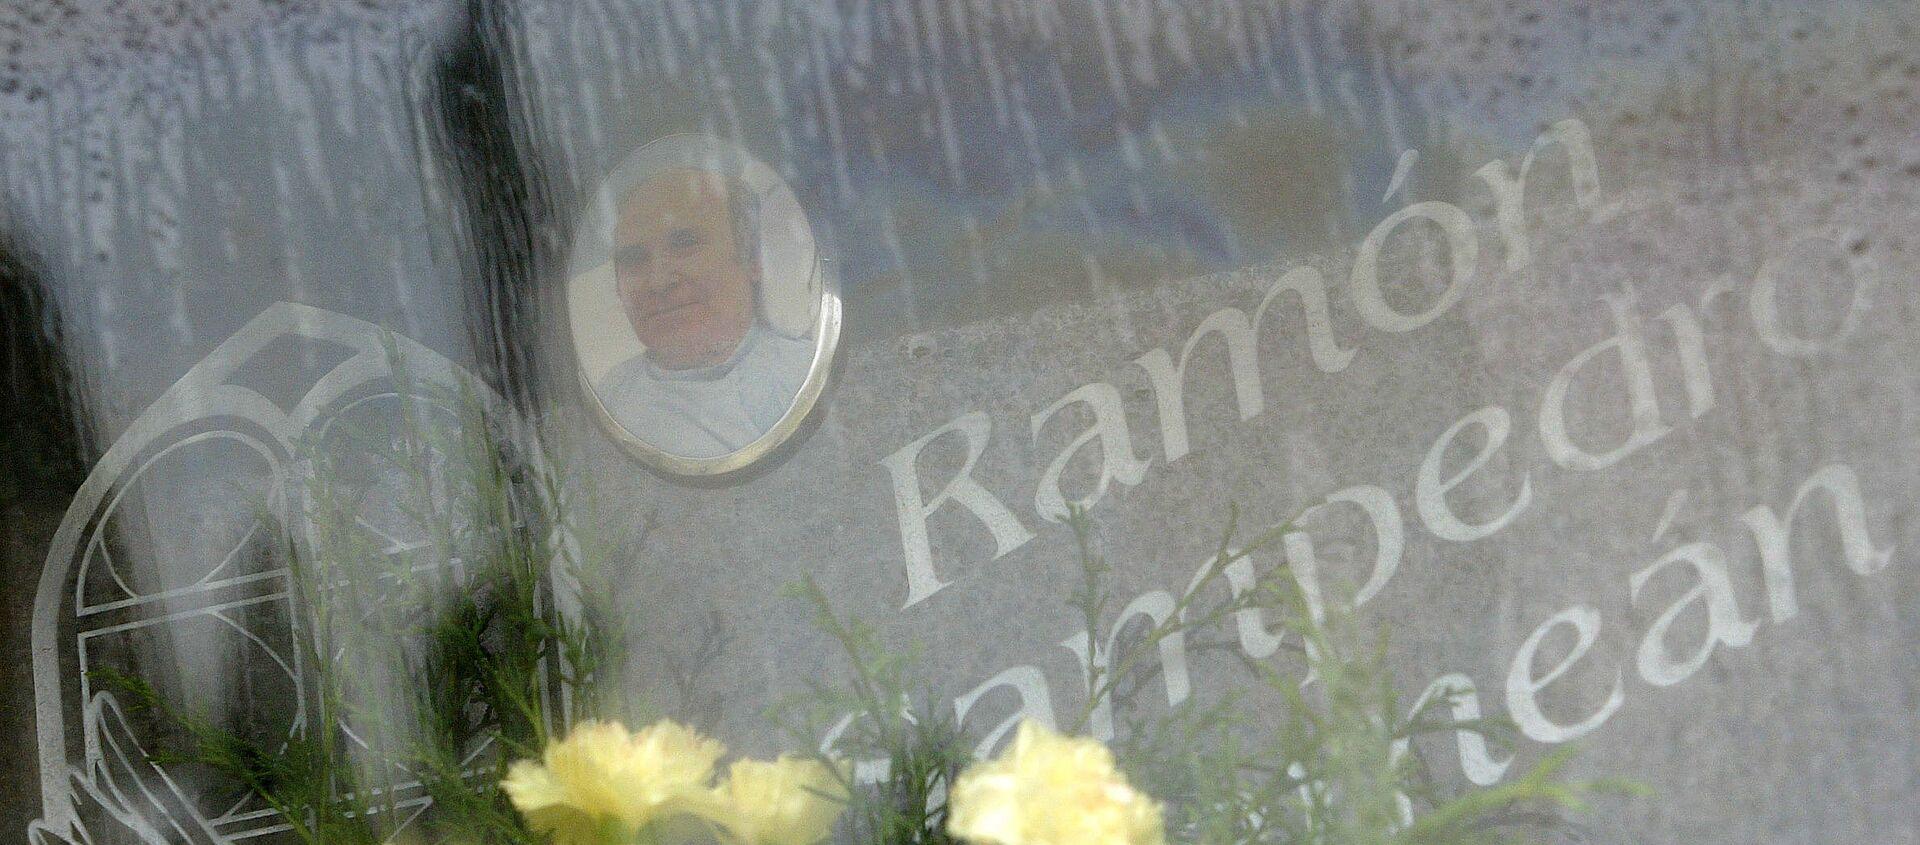 Ramón Sampedro - Sputnik Mundo, 1920, 12.01.2021